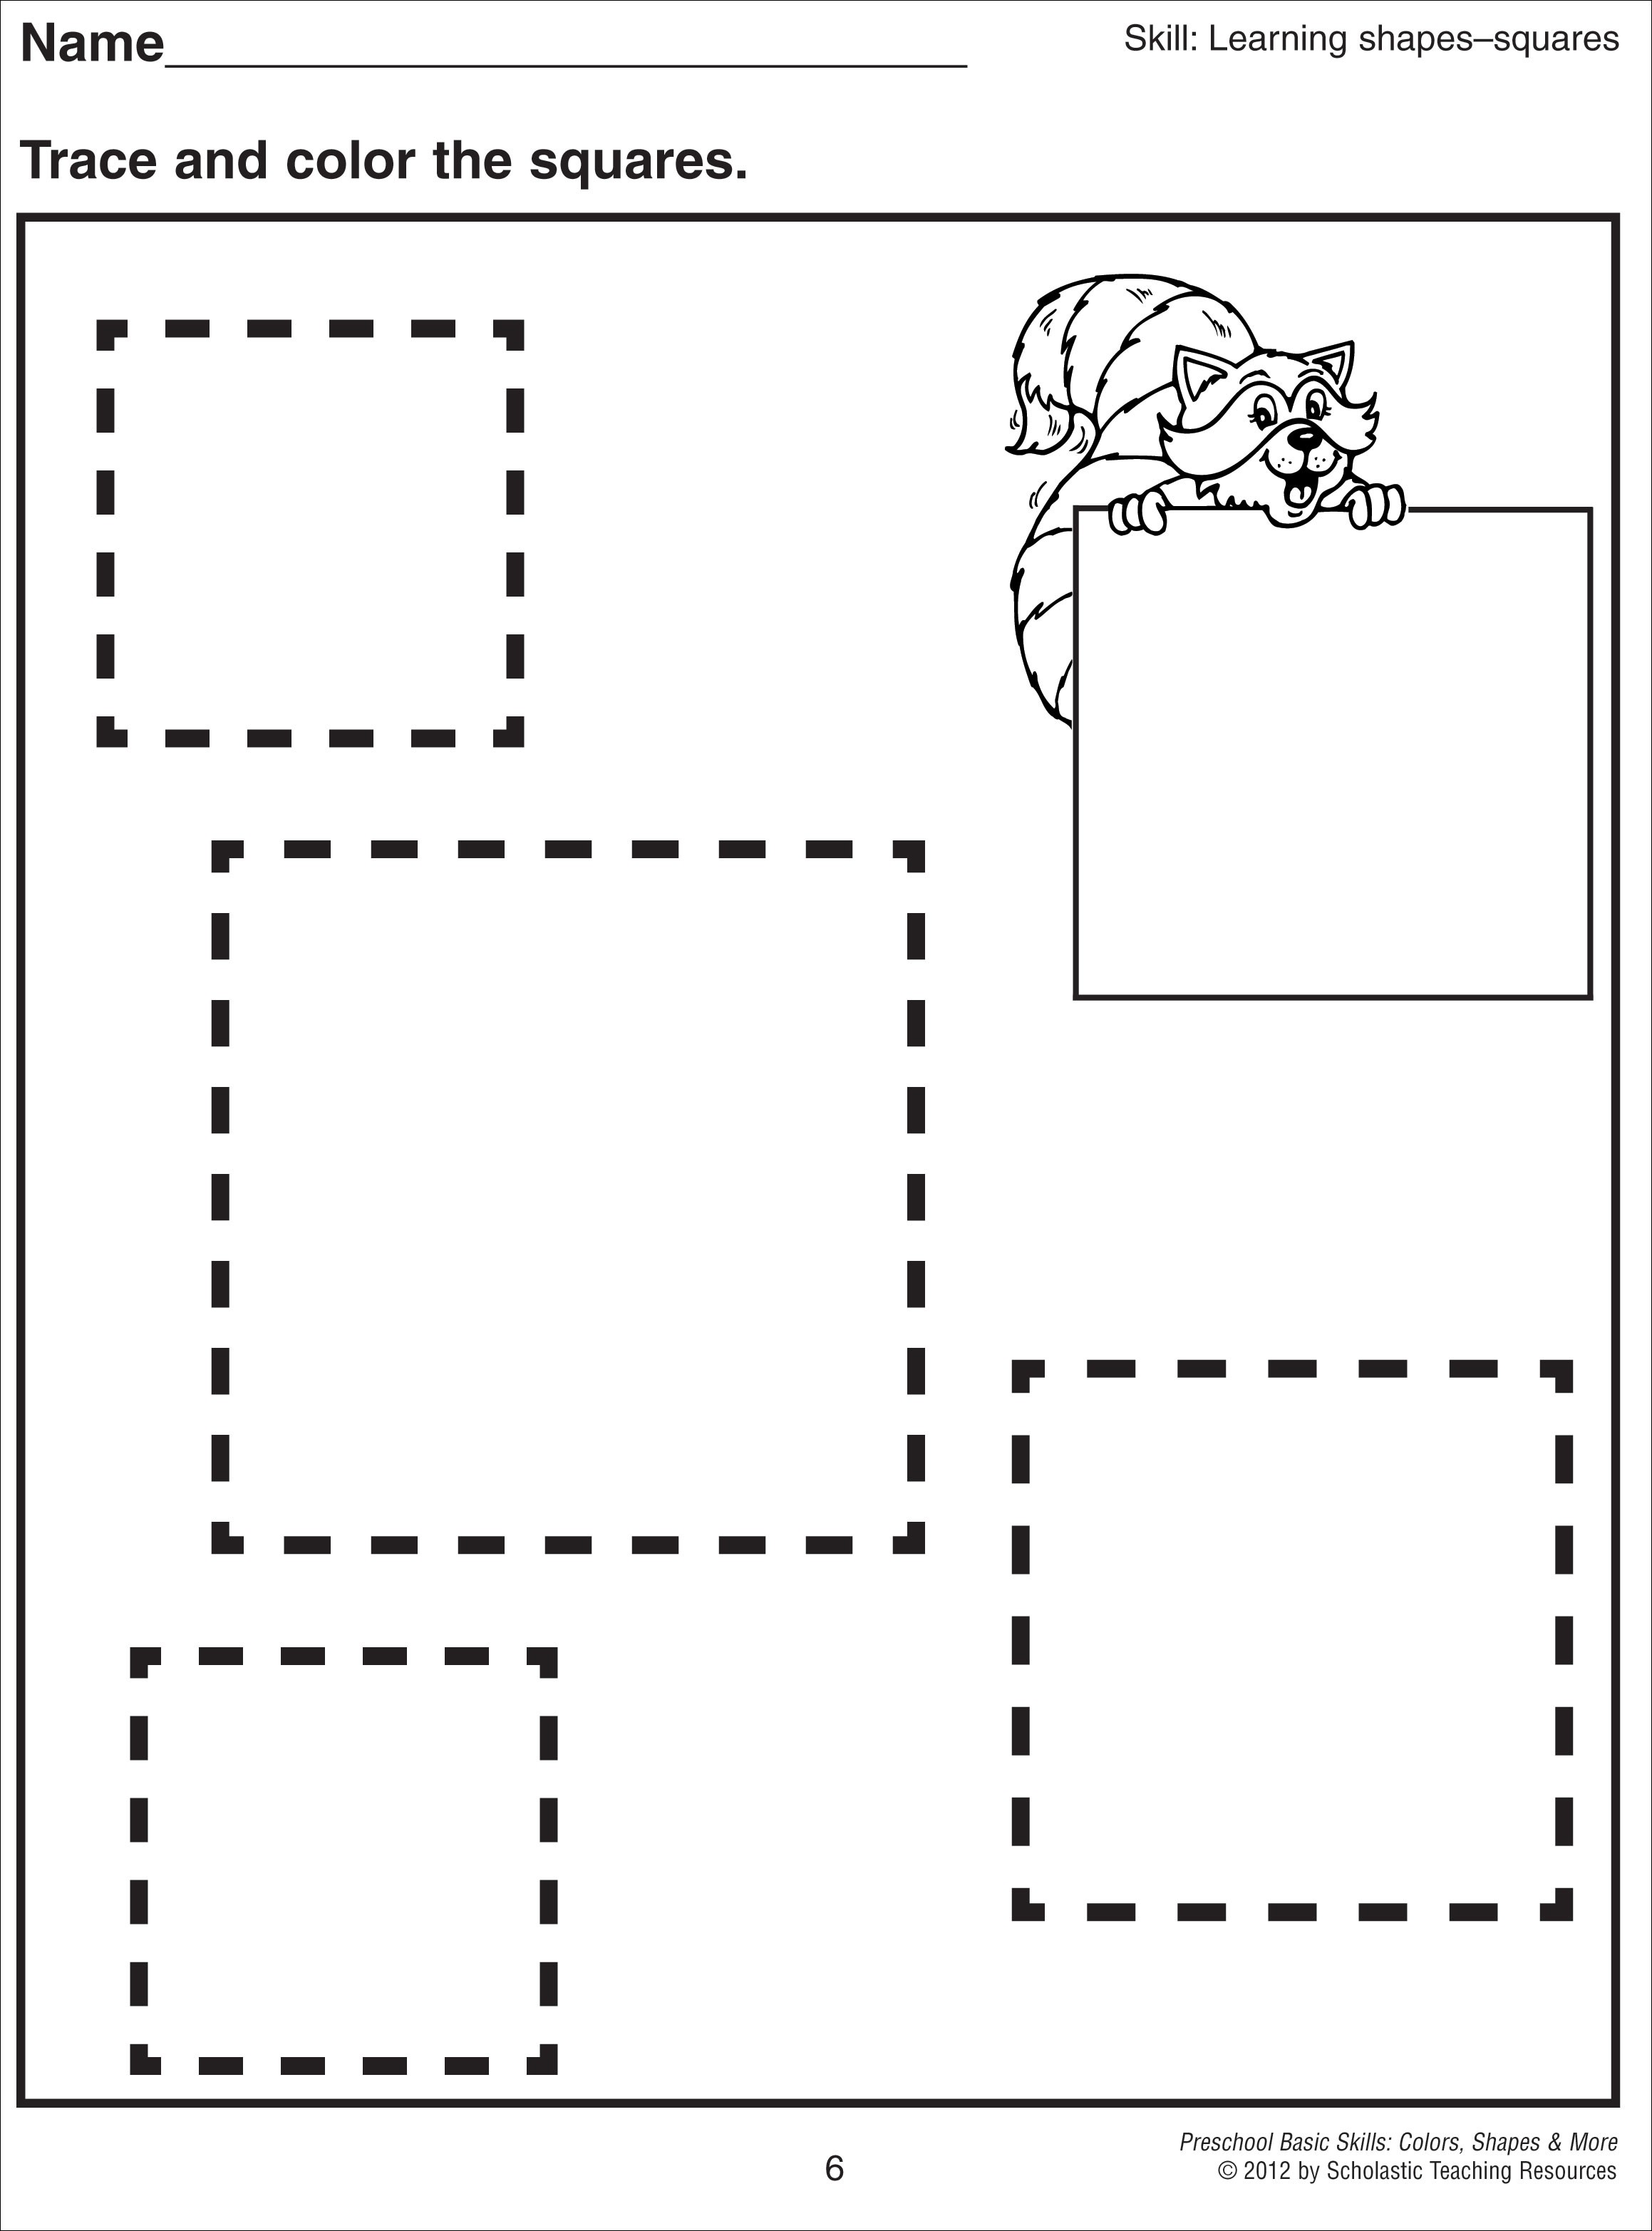 5 Images of Free Printable Preschool Worksheets Squares